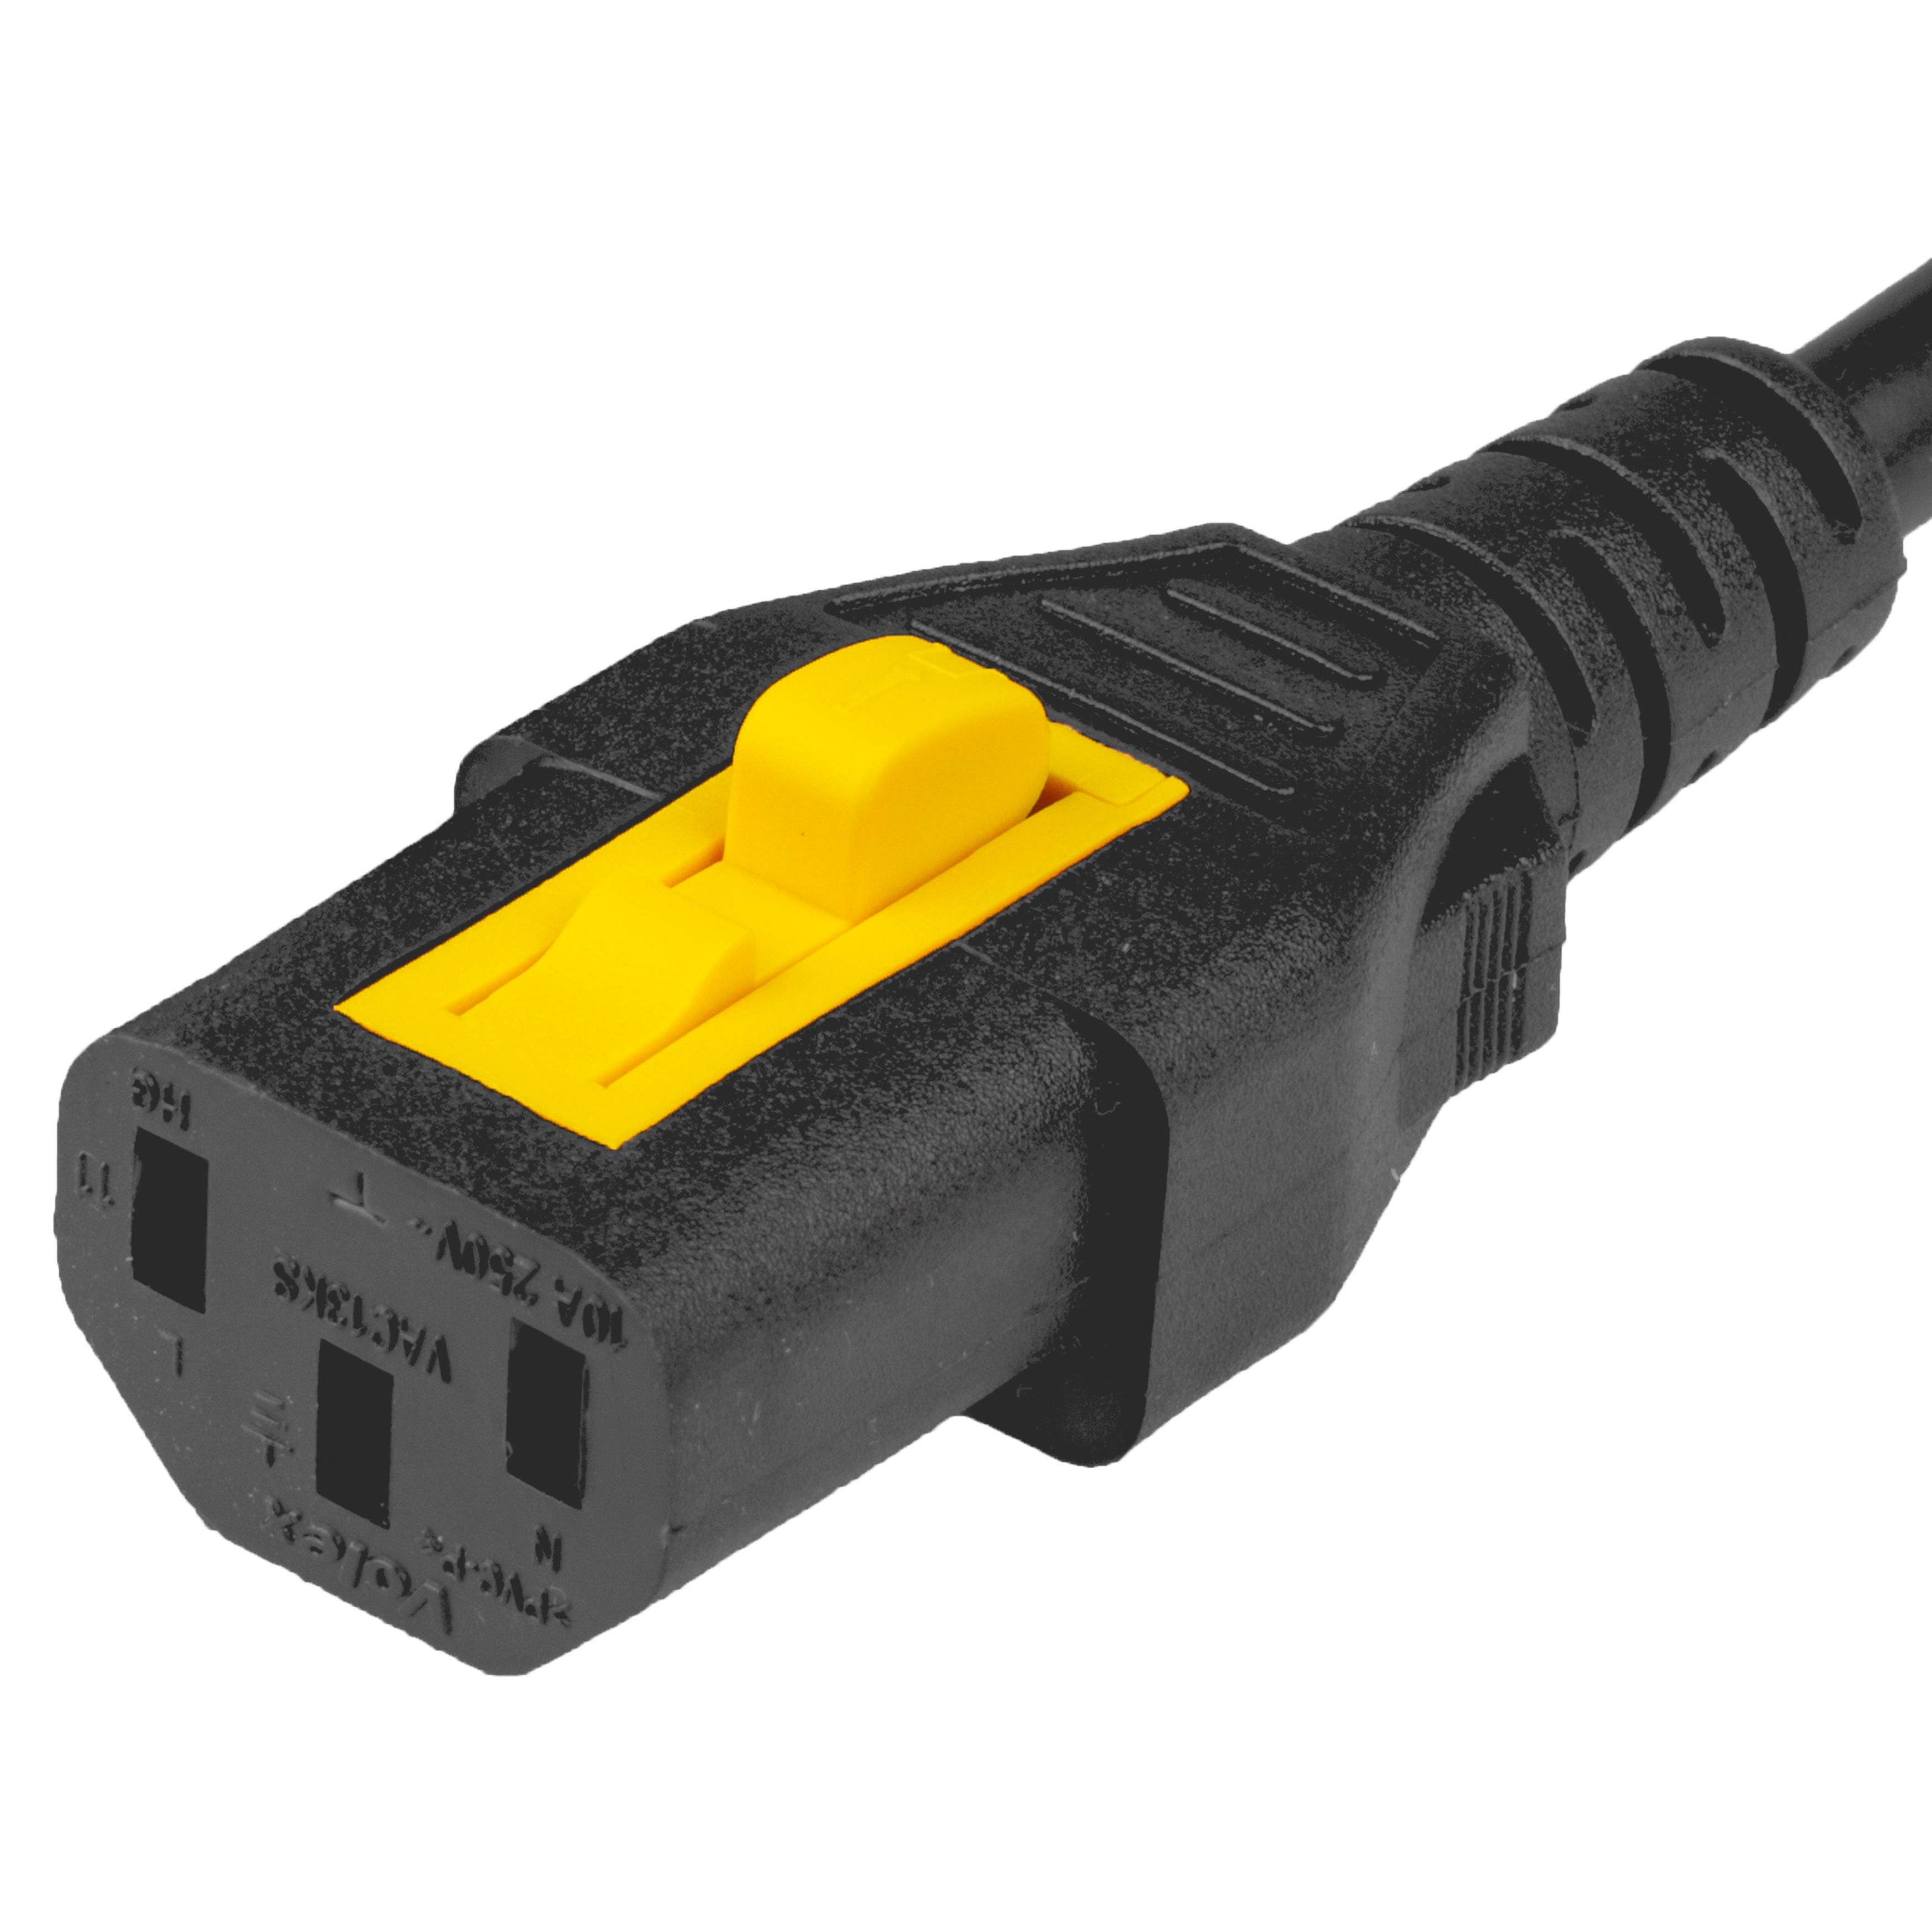 IEC 60320 C13 V Lock